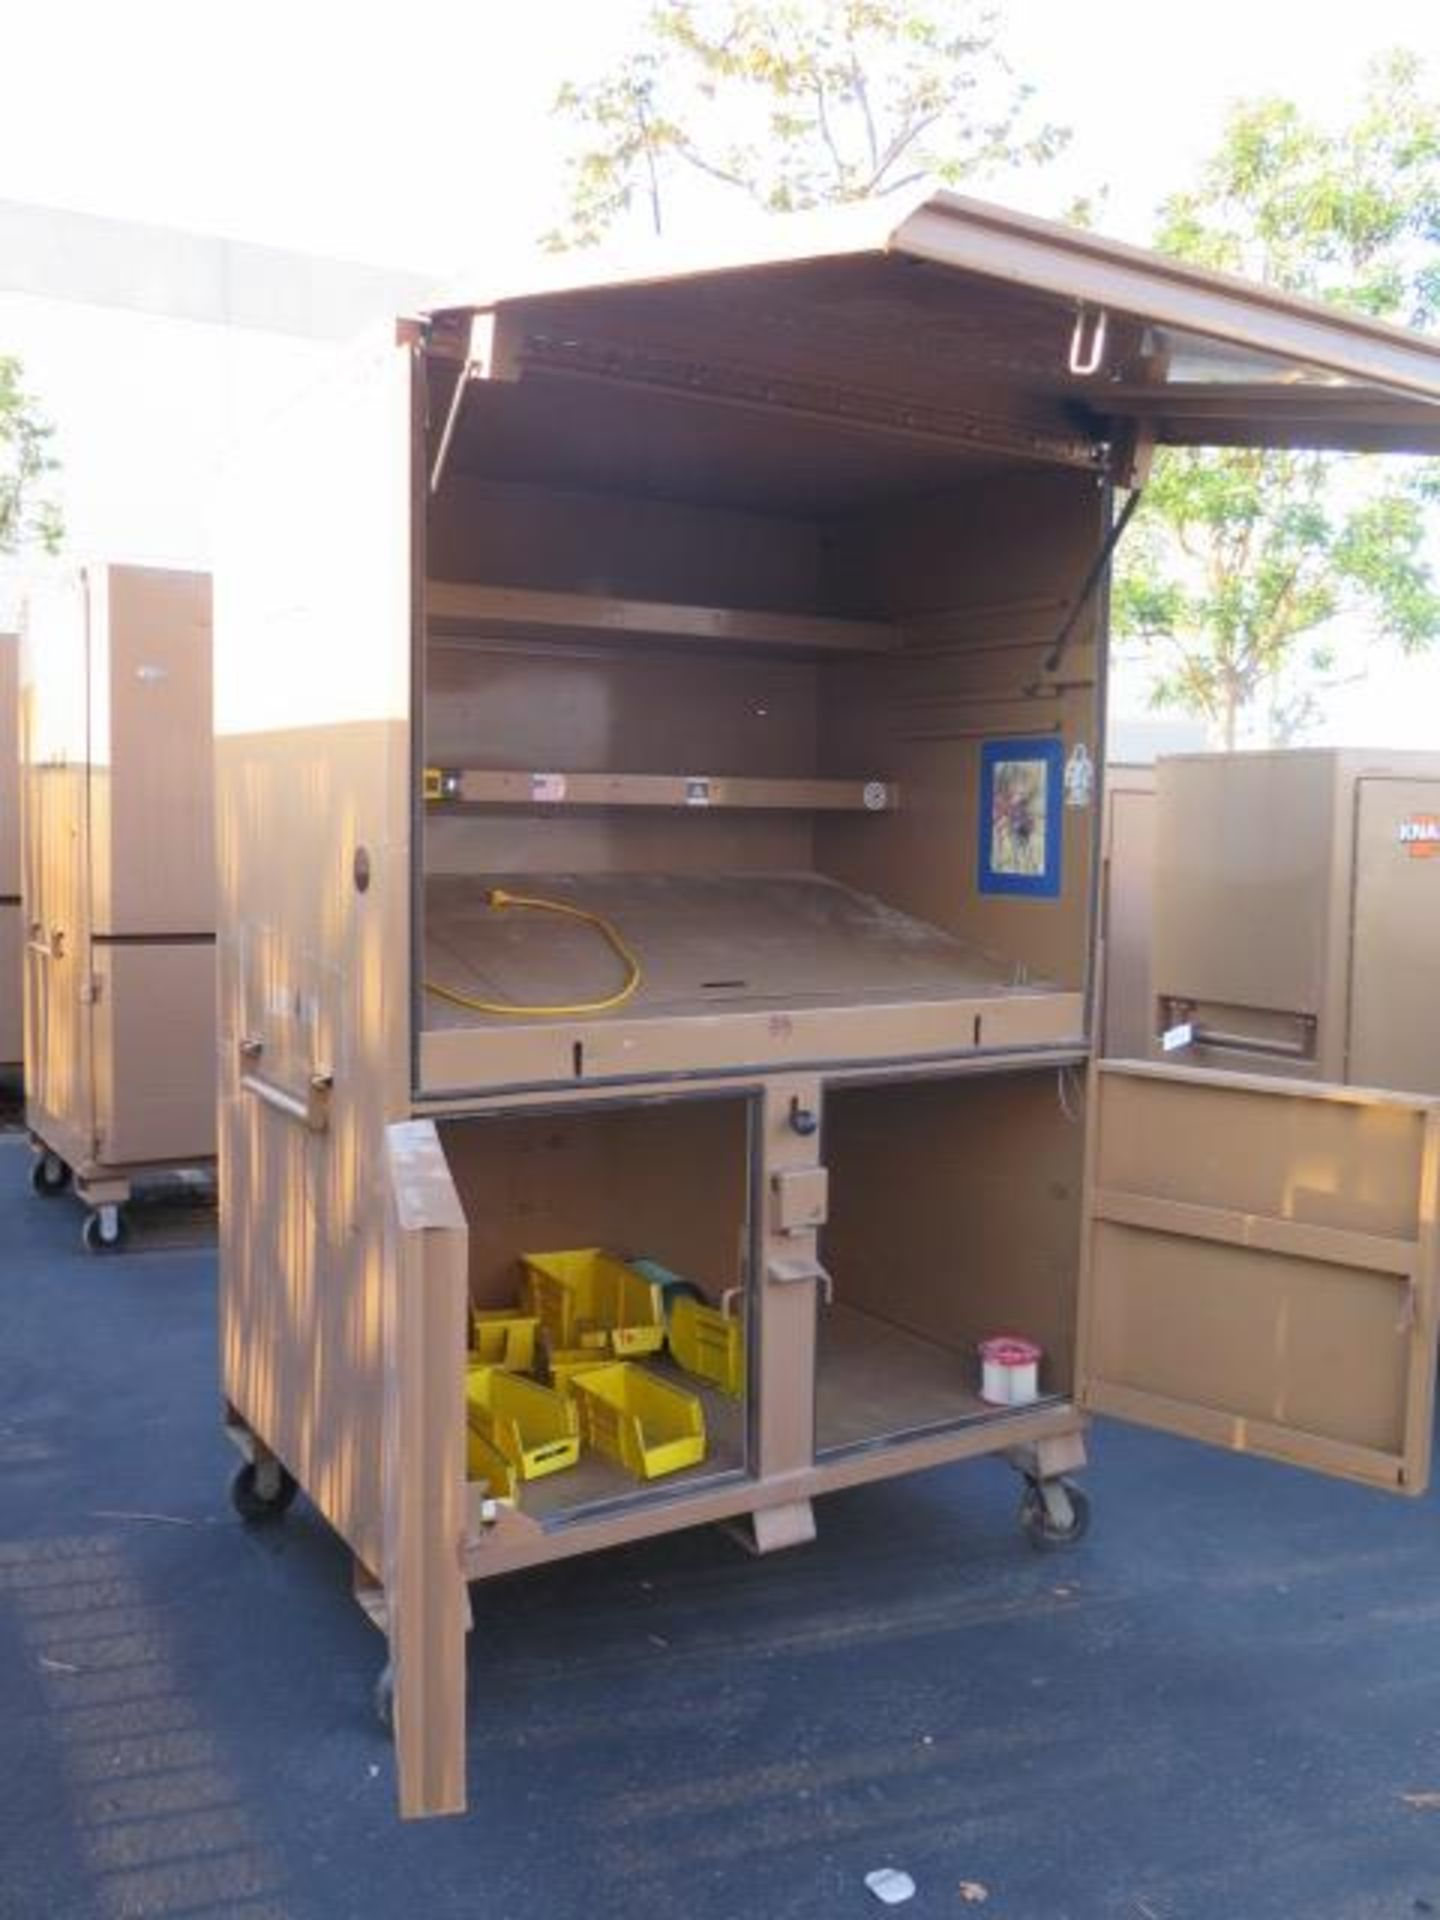 Knaack mdl. 119-01 Rolling Job Box (SOLD AS-IS - NO WARRANTY) - Image 4 of 7